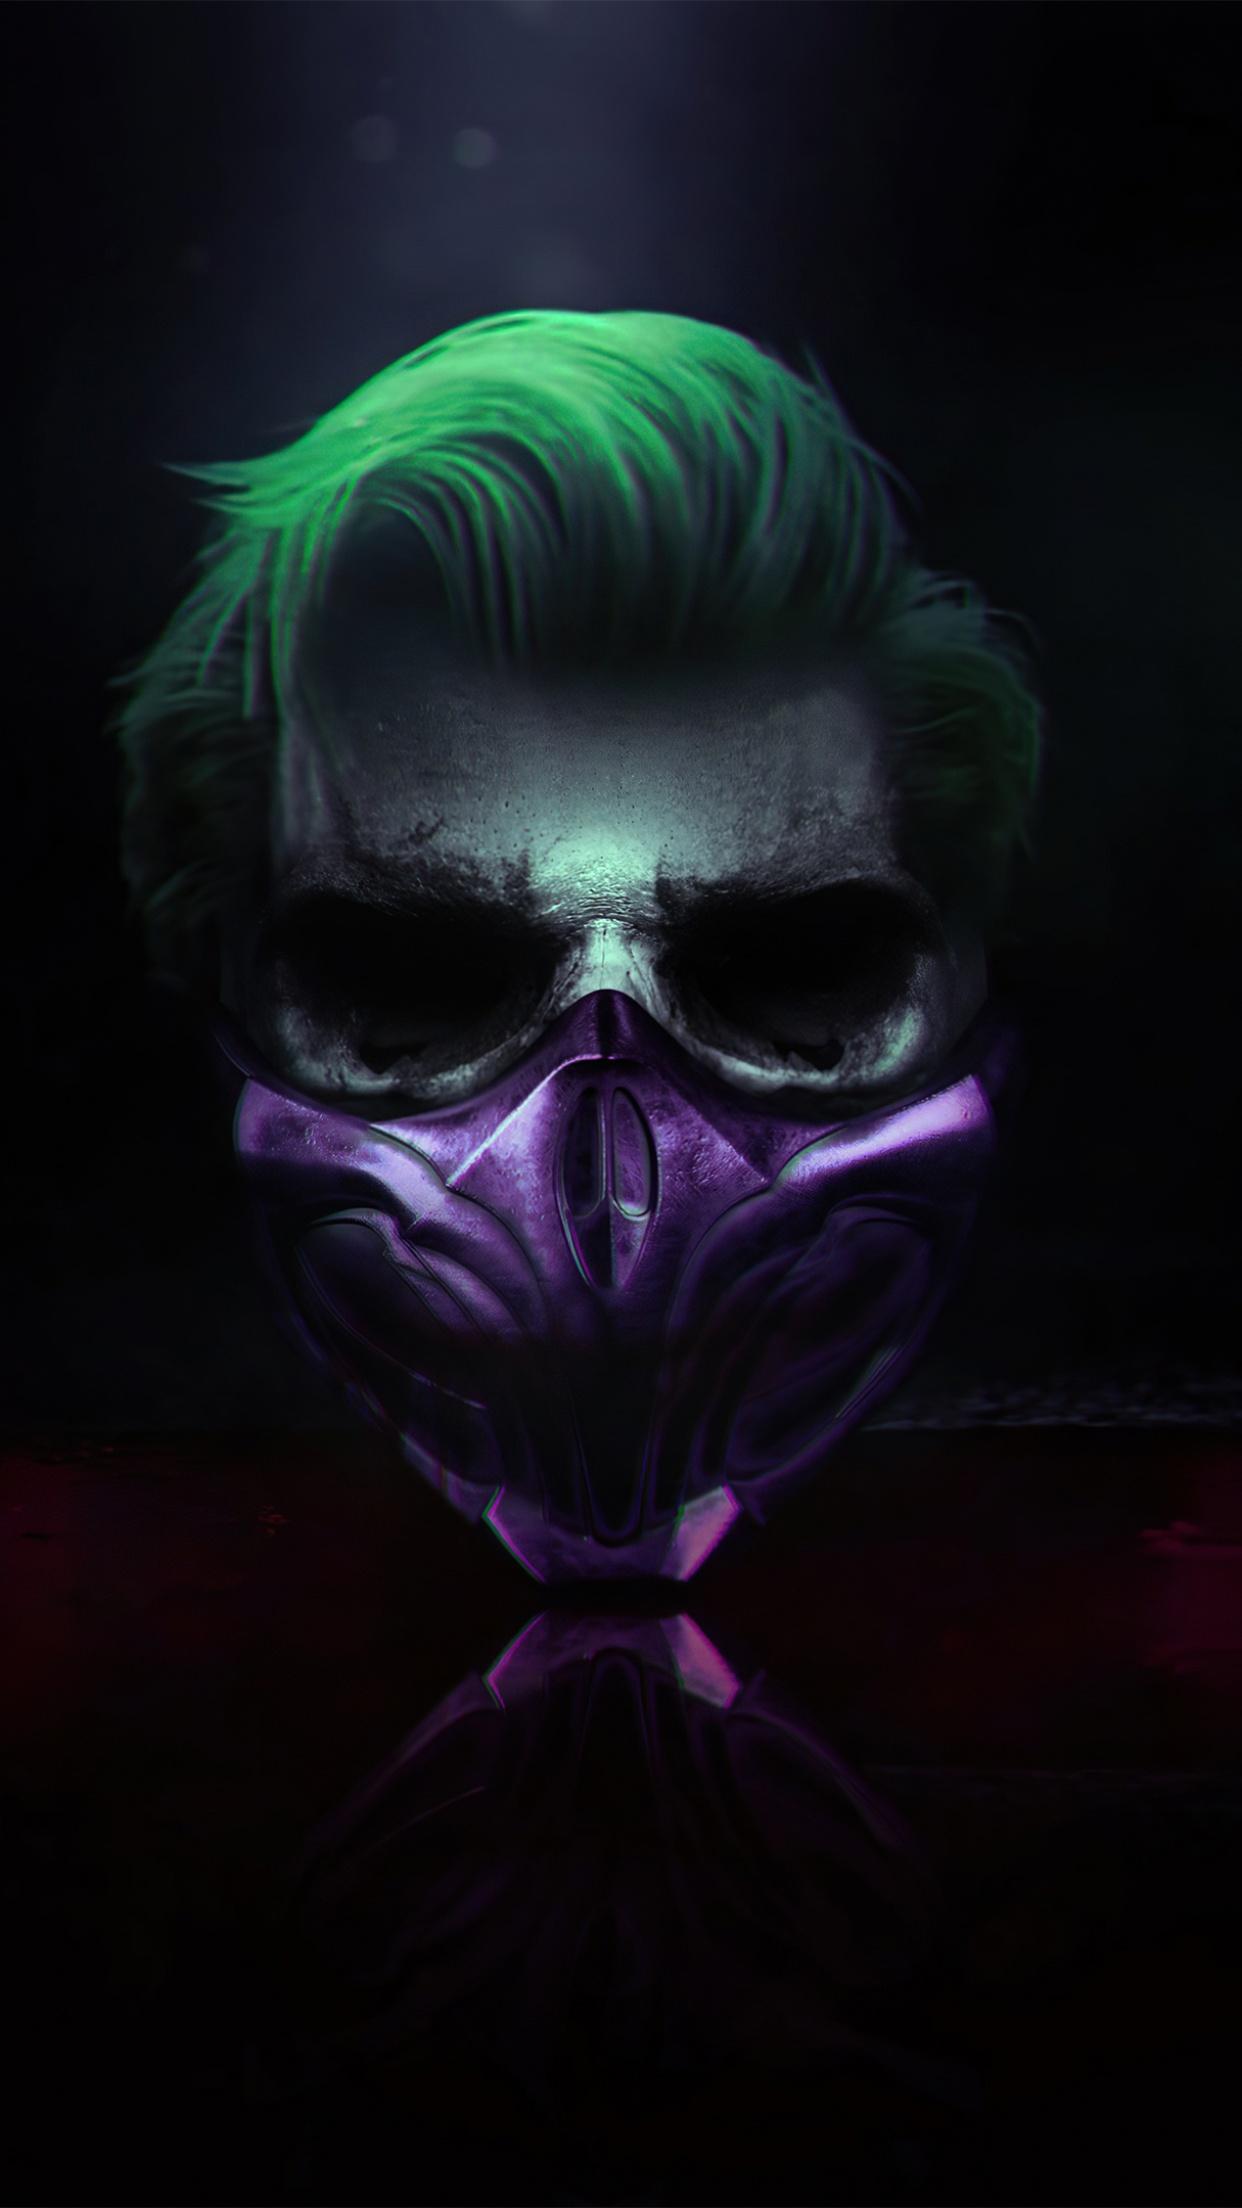 Joker 4k Wallpaper Mask Cyberpunk Dark Background Graphics Cgi 1483 Joker, joker (2019 movie), joaquin phoenix, dc comics, movies. joker 4k wallpaper mask cyberpunk